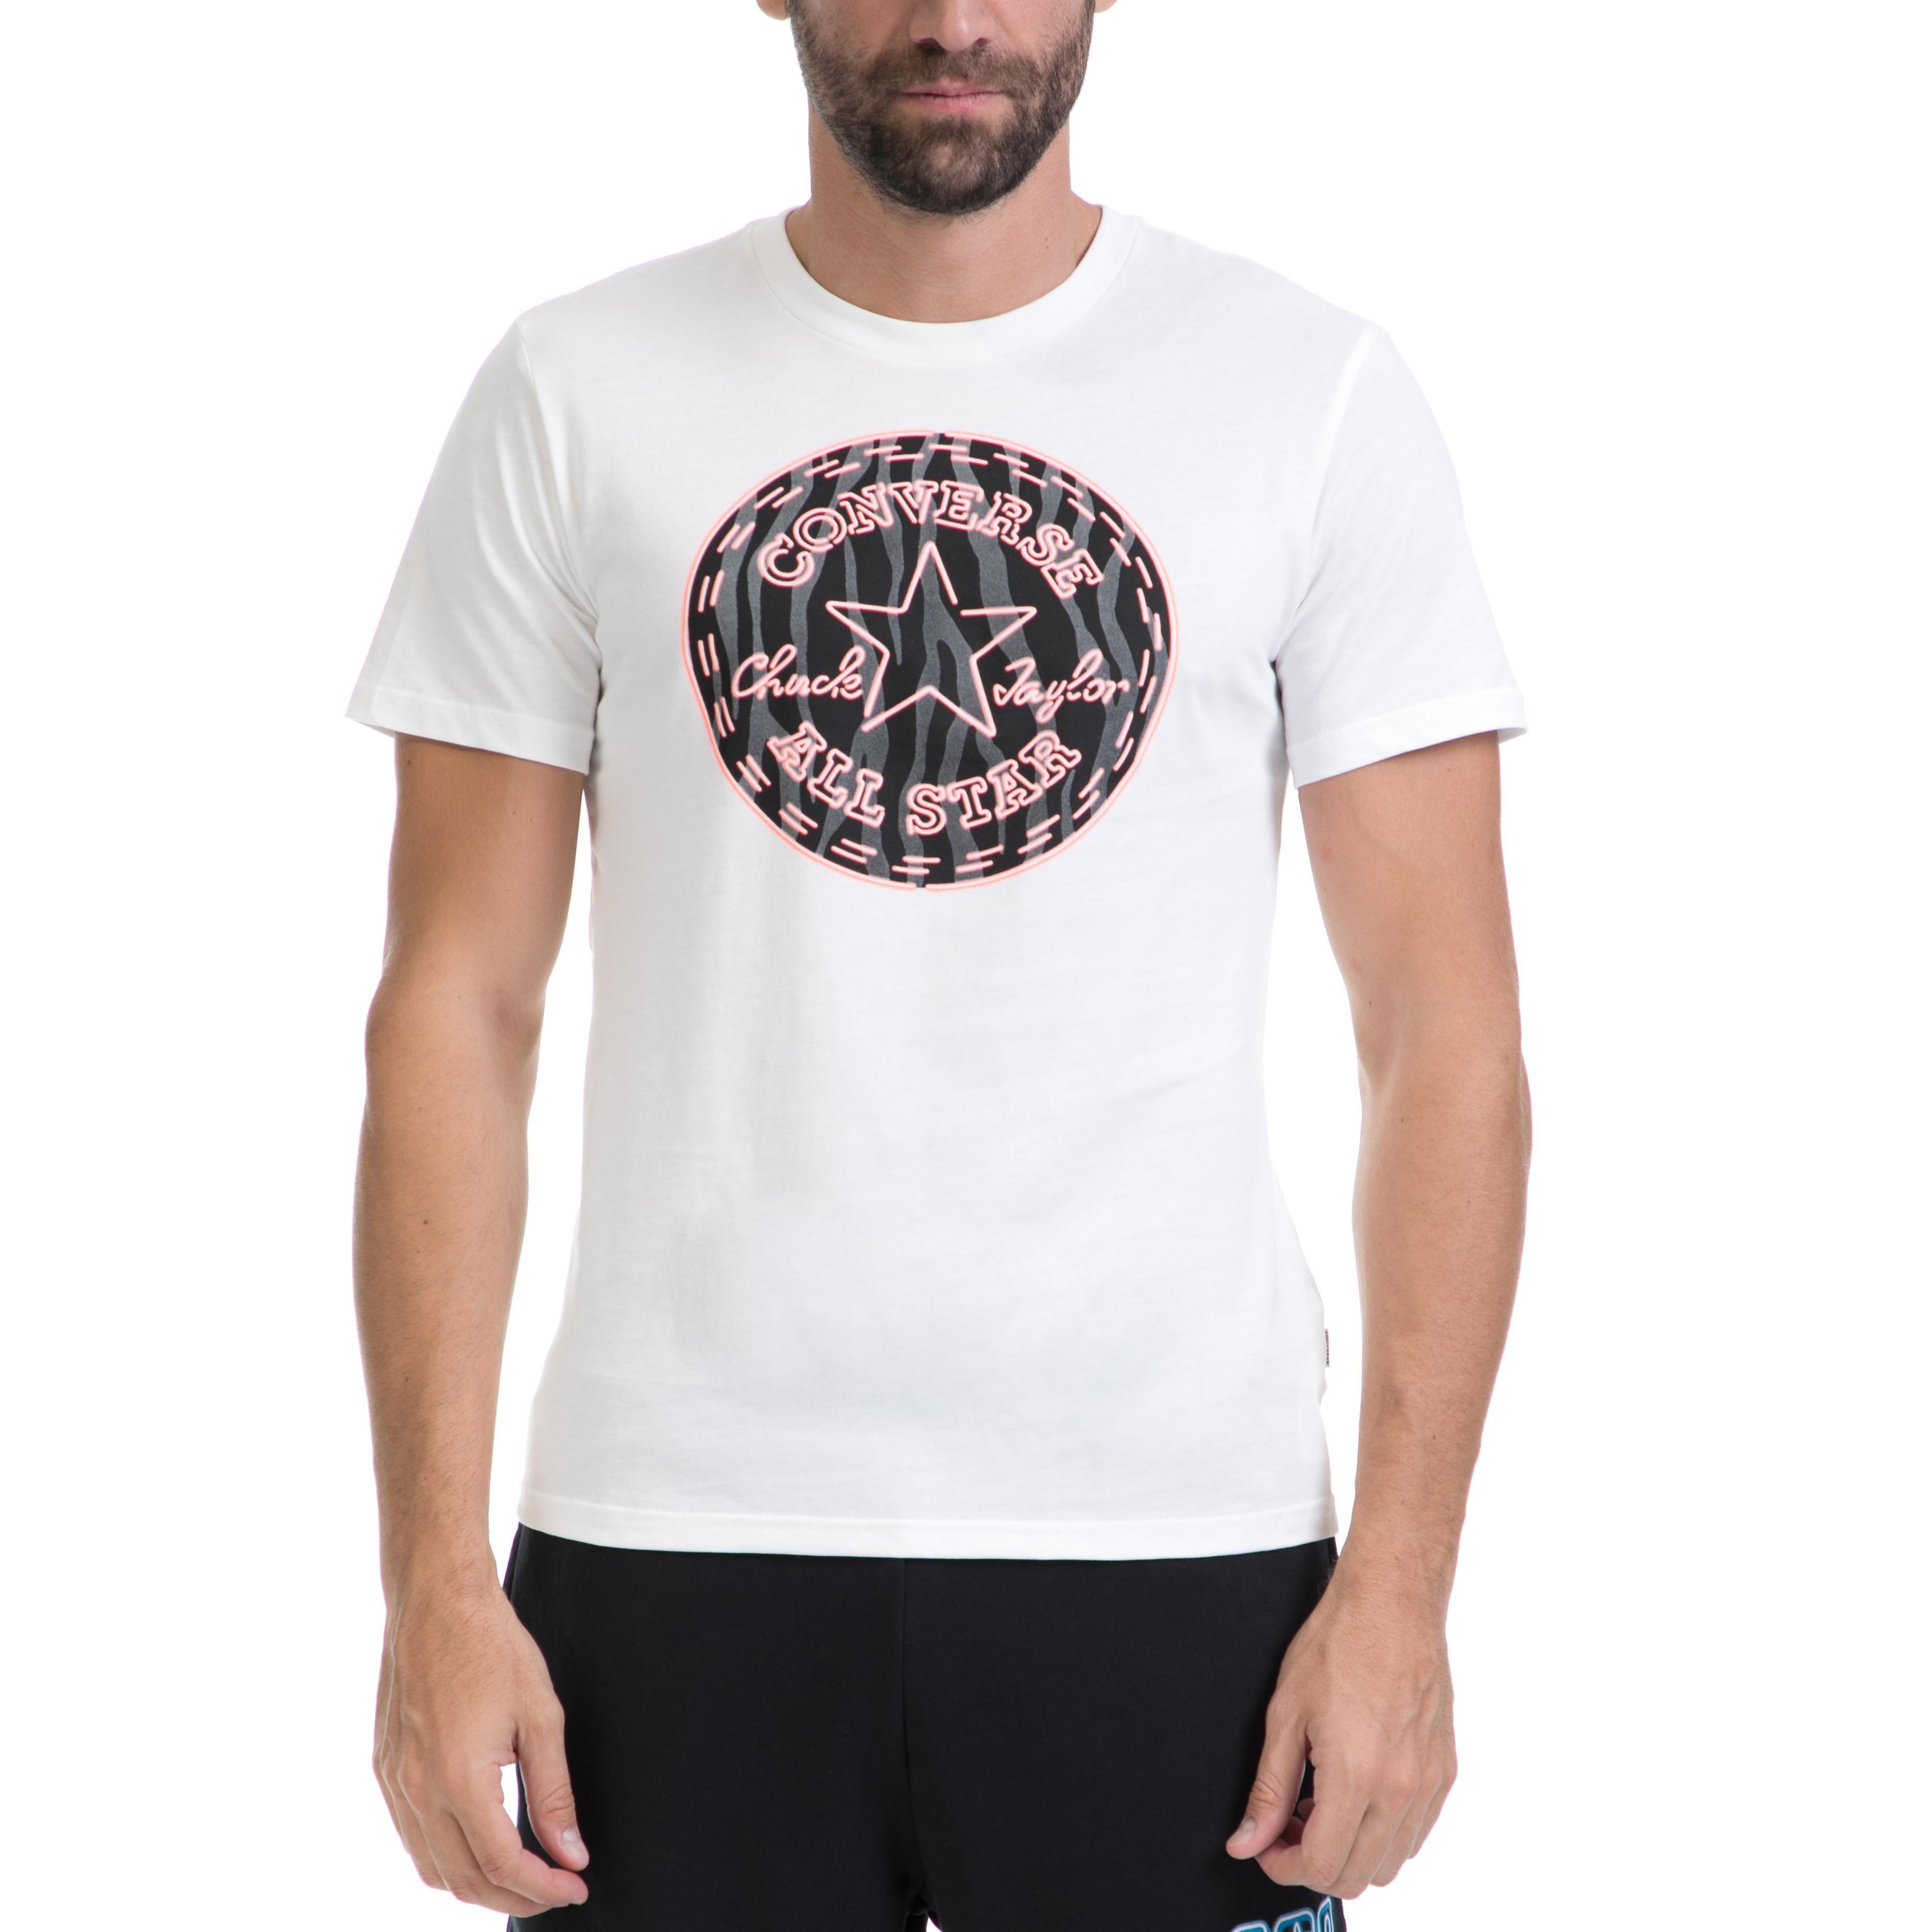 CONVERSE - Αντρική μπλούζα CONVERSE άσπρη ανδρικά ρούχα αθλητικά t shirt